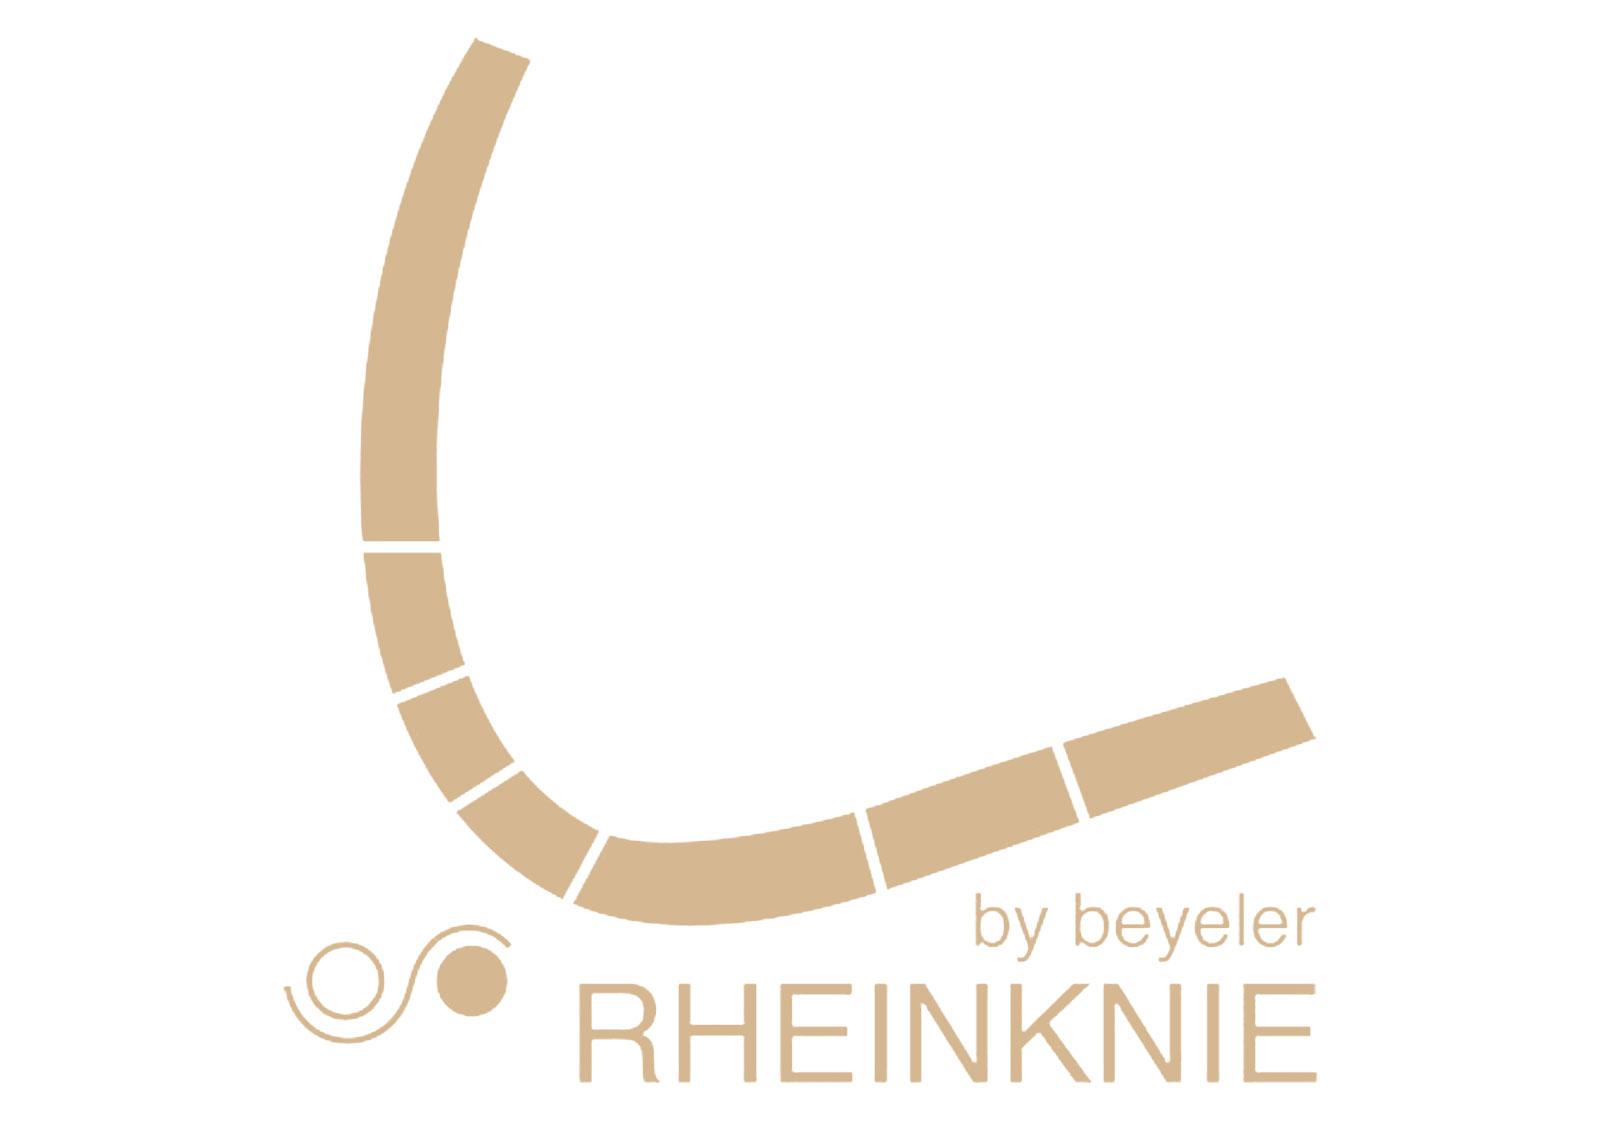 Des lunettes d'un design bâlois avec «Rheinknie by beyeler»